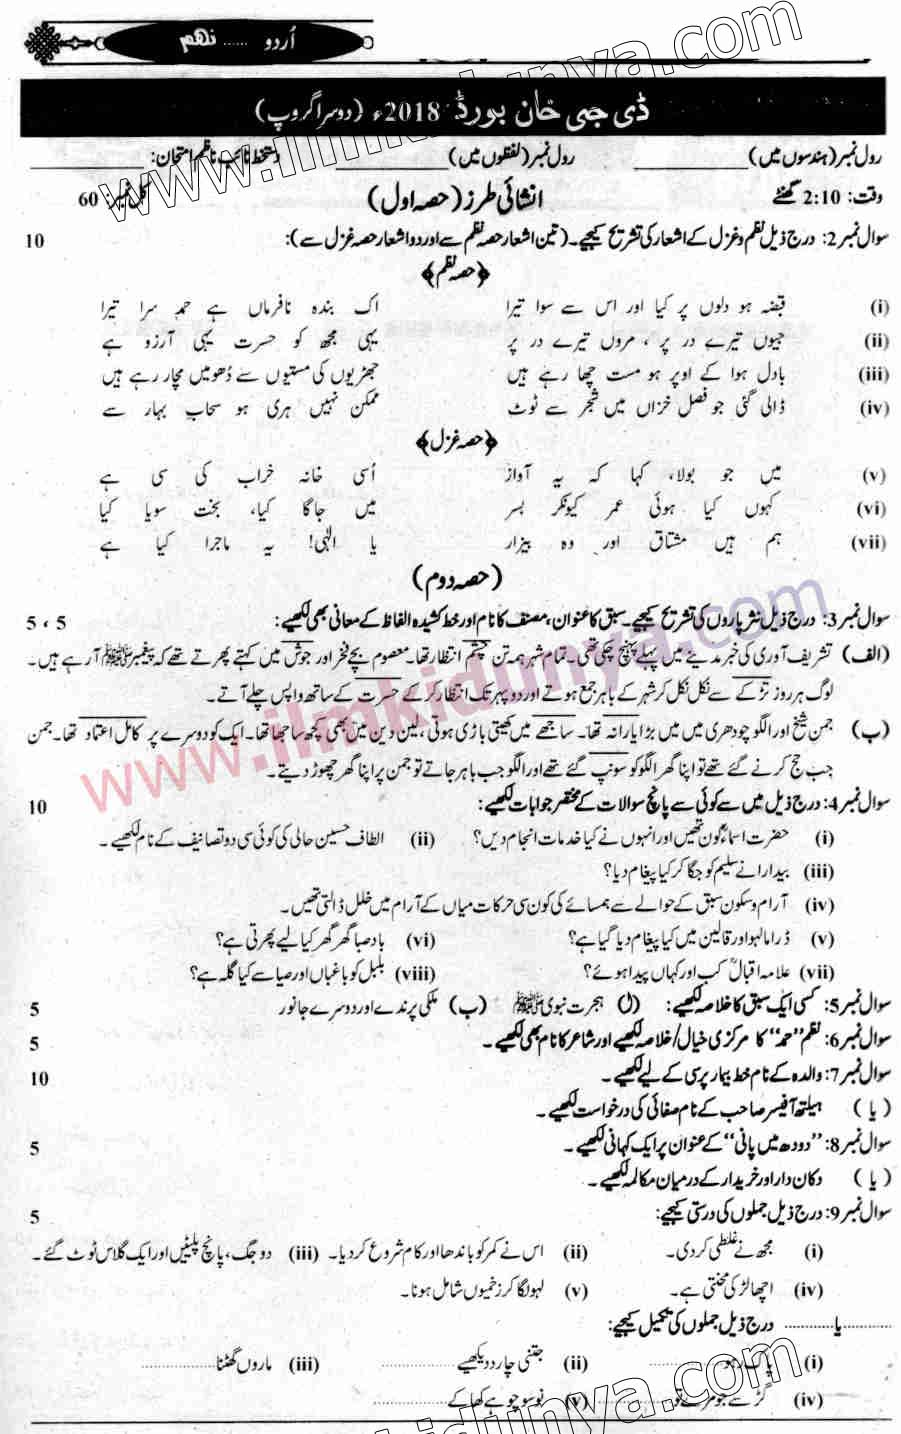 Past Papers 2018 DG Khan Board 9th Class Urdu Group 2 Subjective